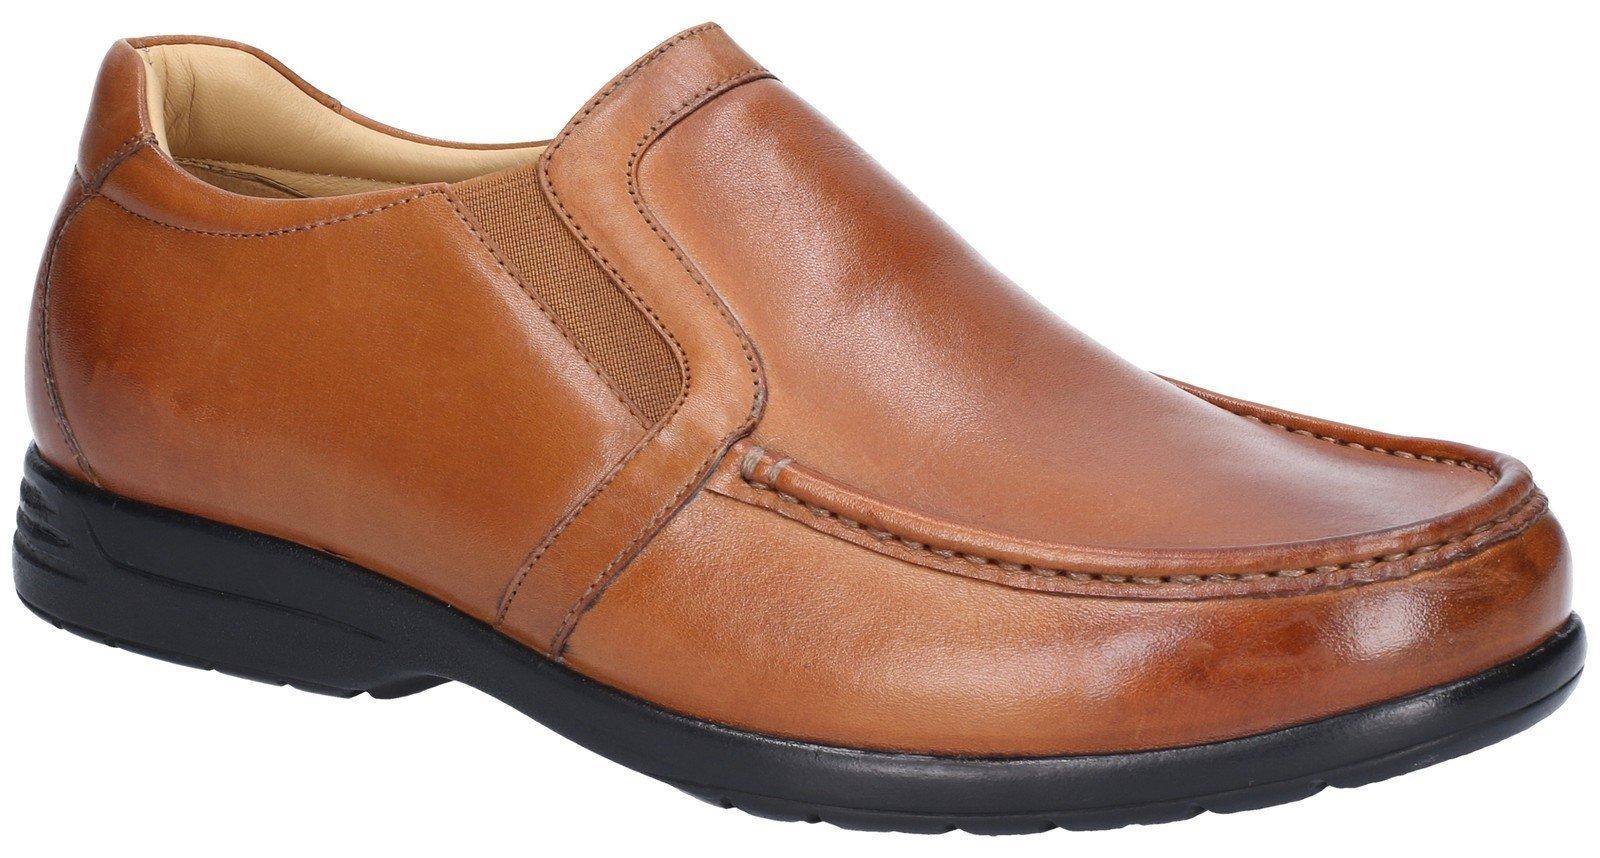 Fleet & Foster Men's Gordon Dual Fit Shoe Brown 29002-49017 - Tan 13